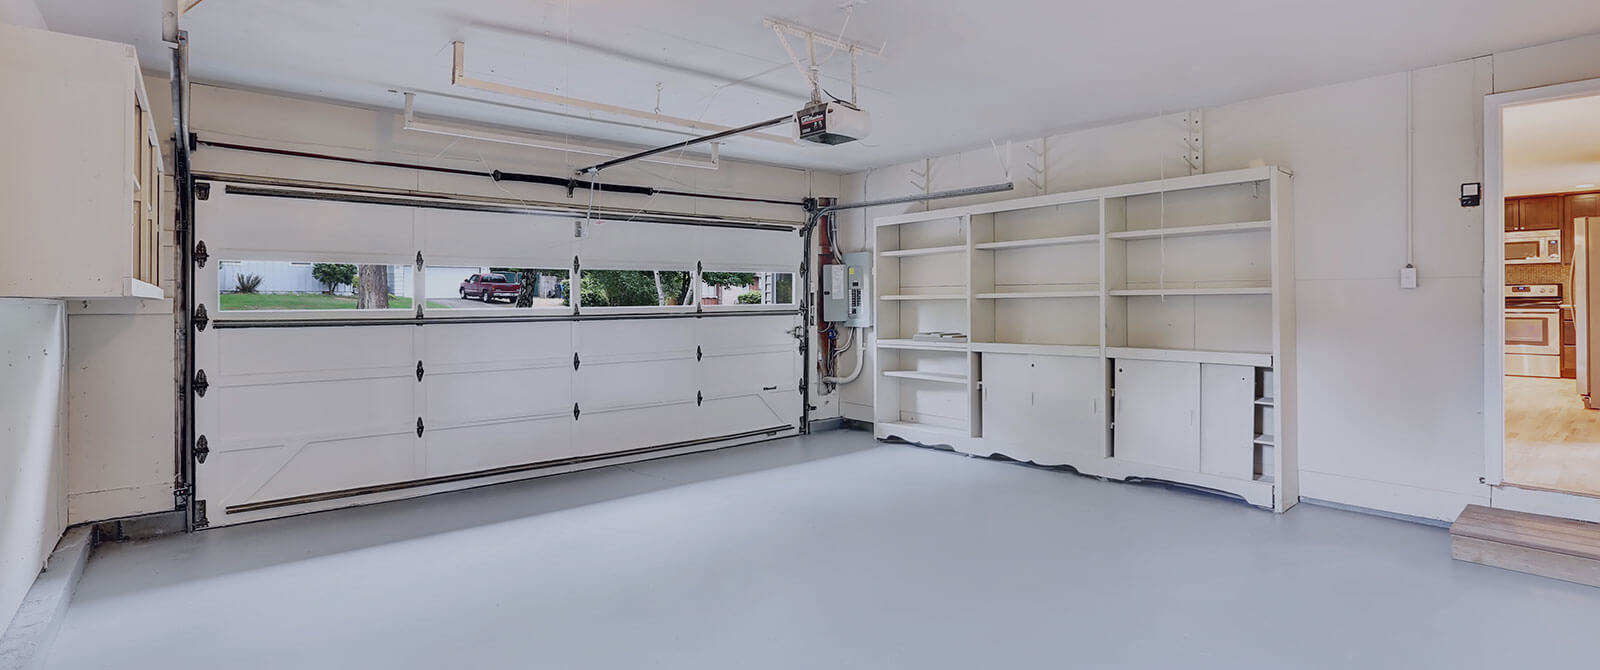 Handicapped closet installation free estimate template